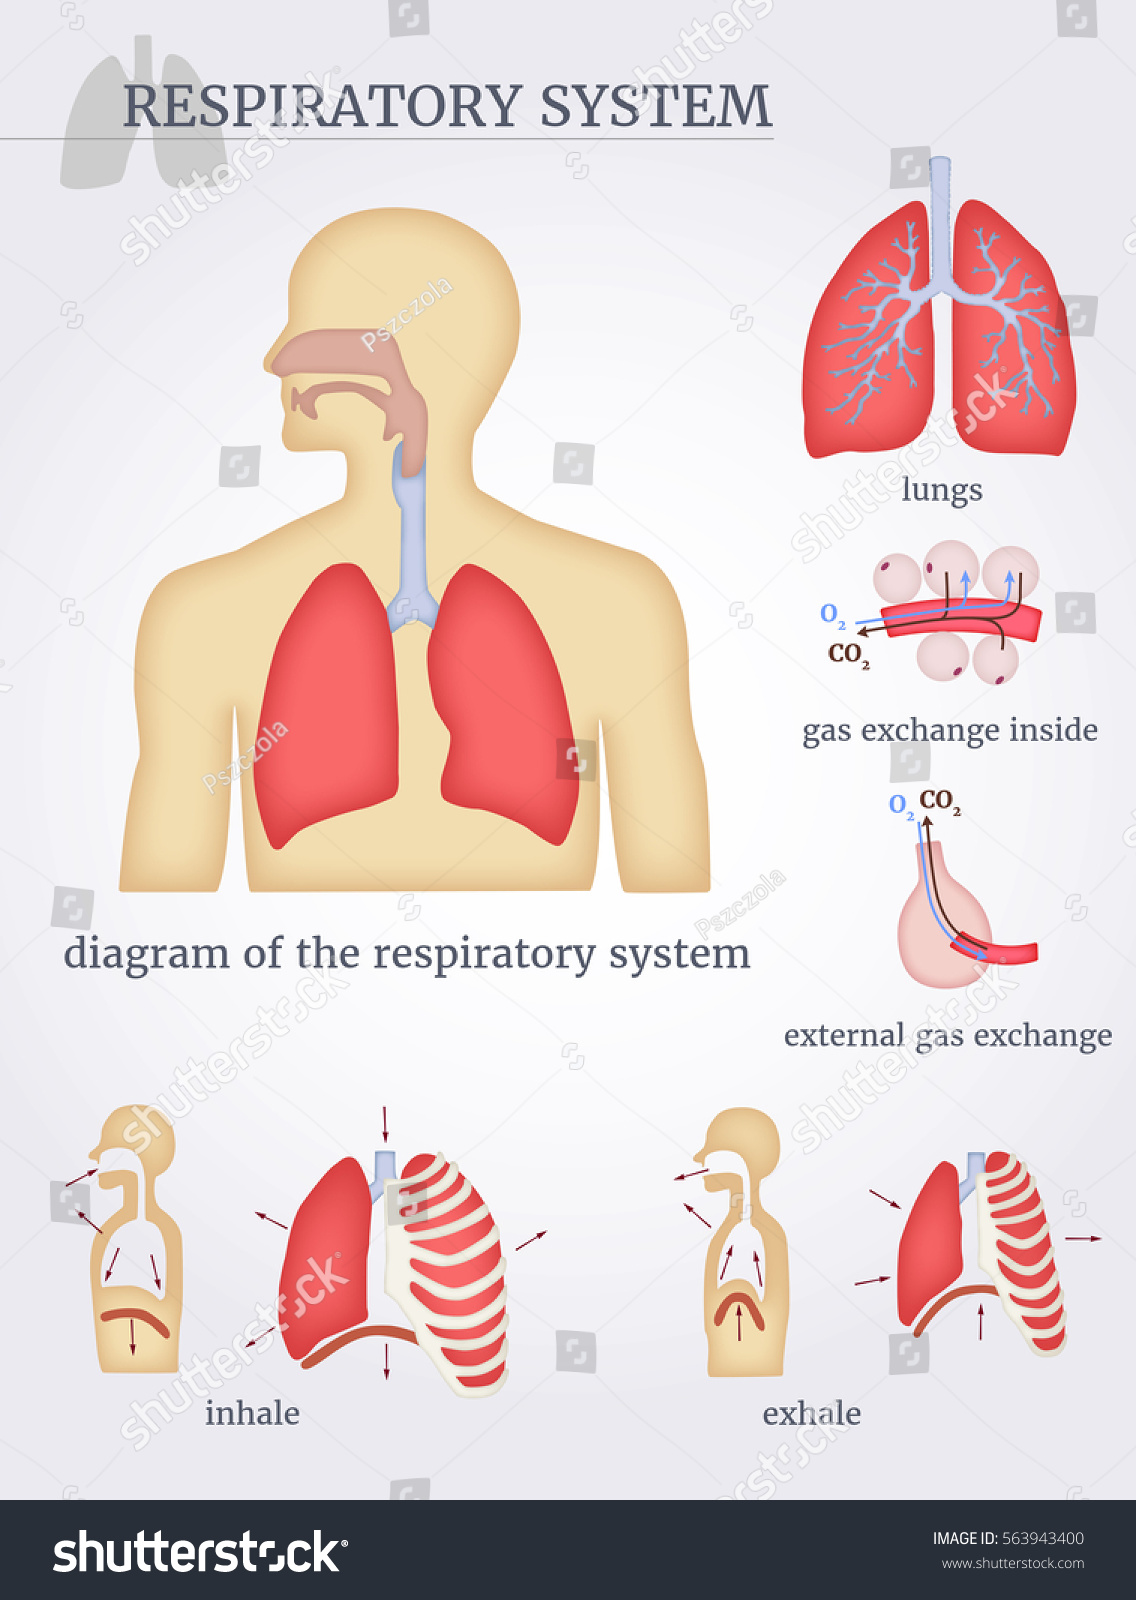 Respiratory system diagram respiratory system lungs em vetor stock respiratory system diagram of the respiratory system with lungs inside gas exchange external ccuart Choice Image